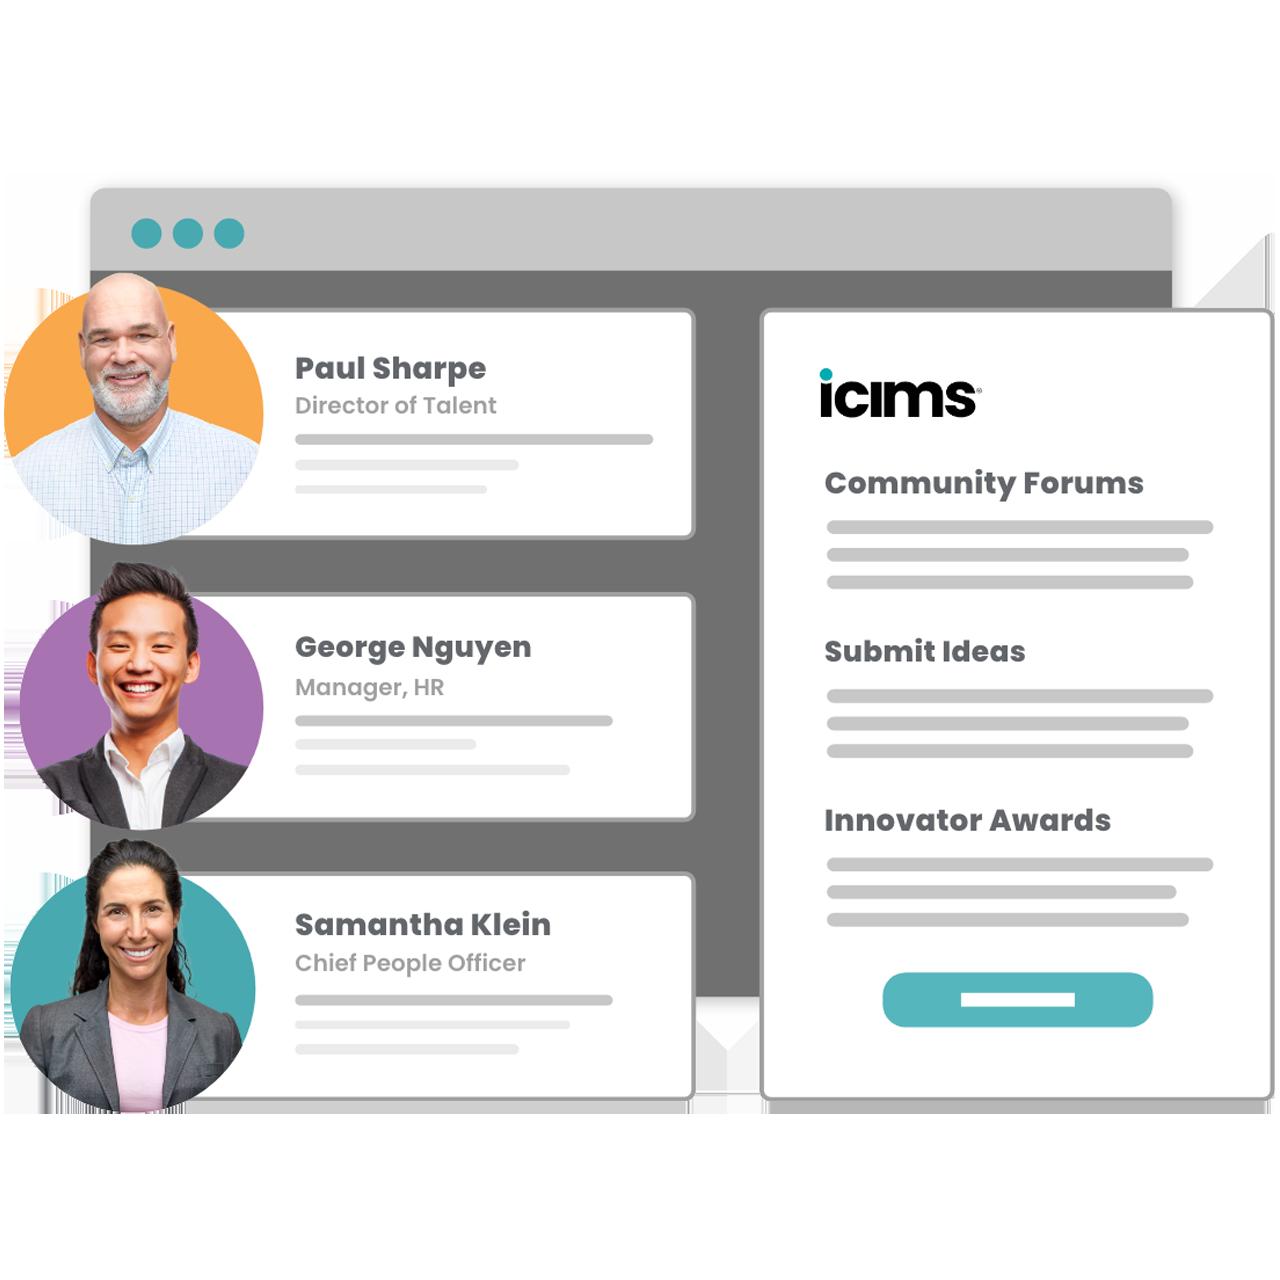 iCIMS customer community member profiles